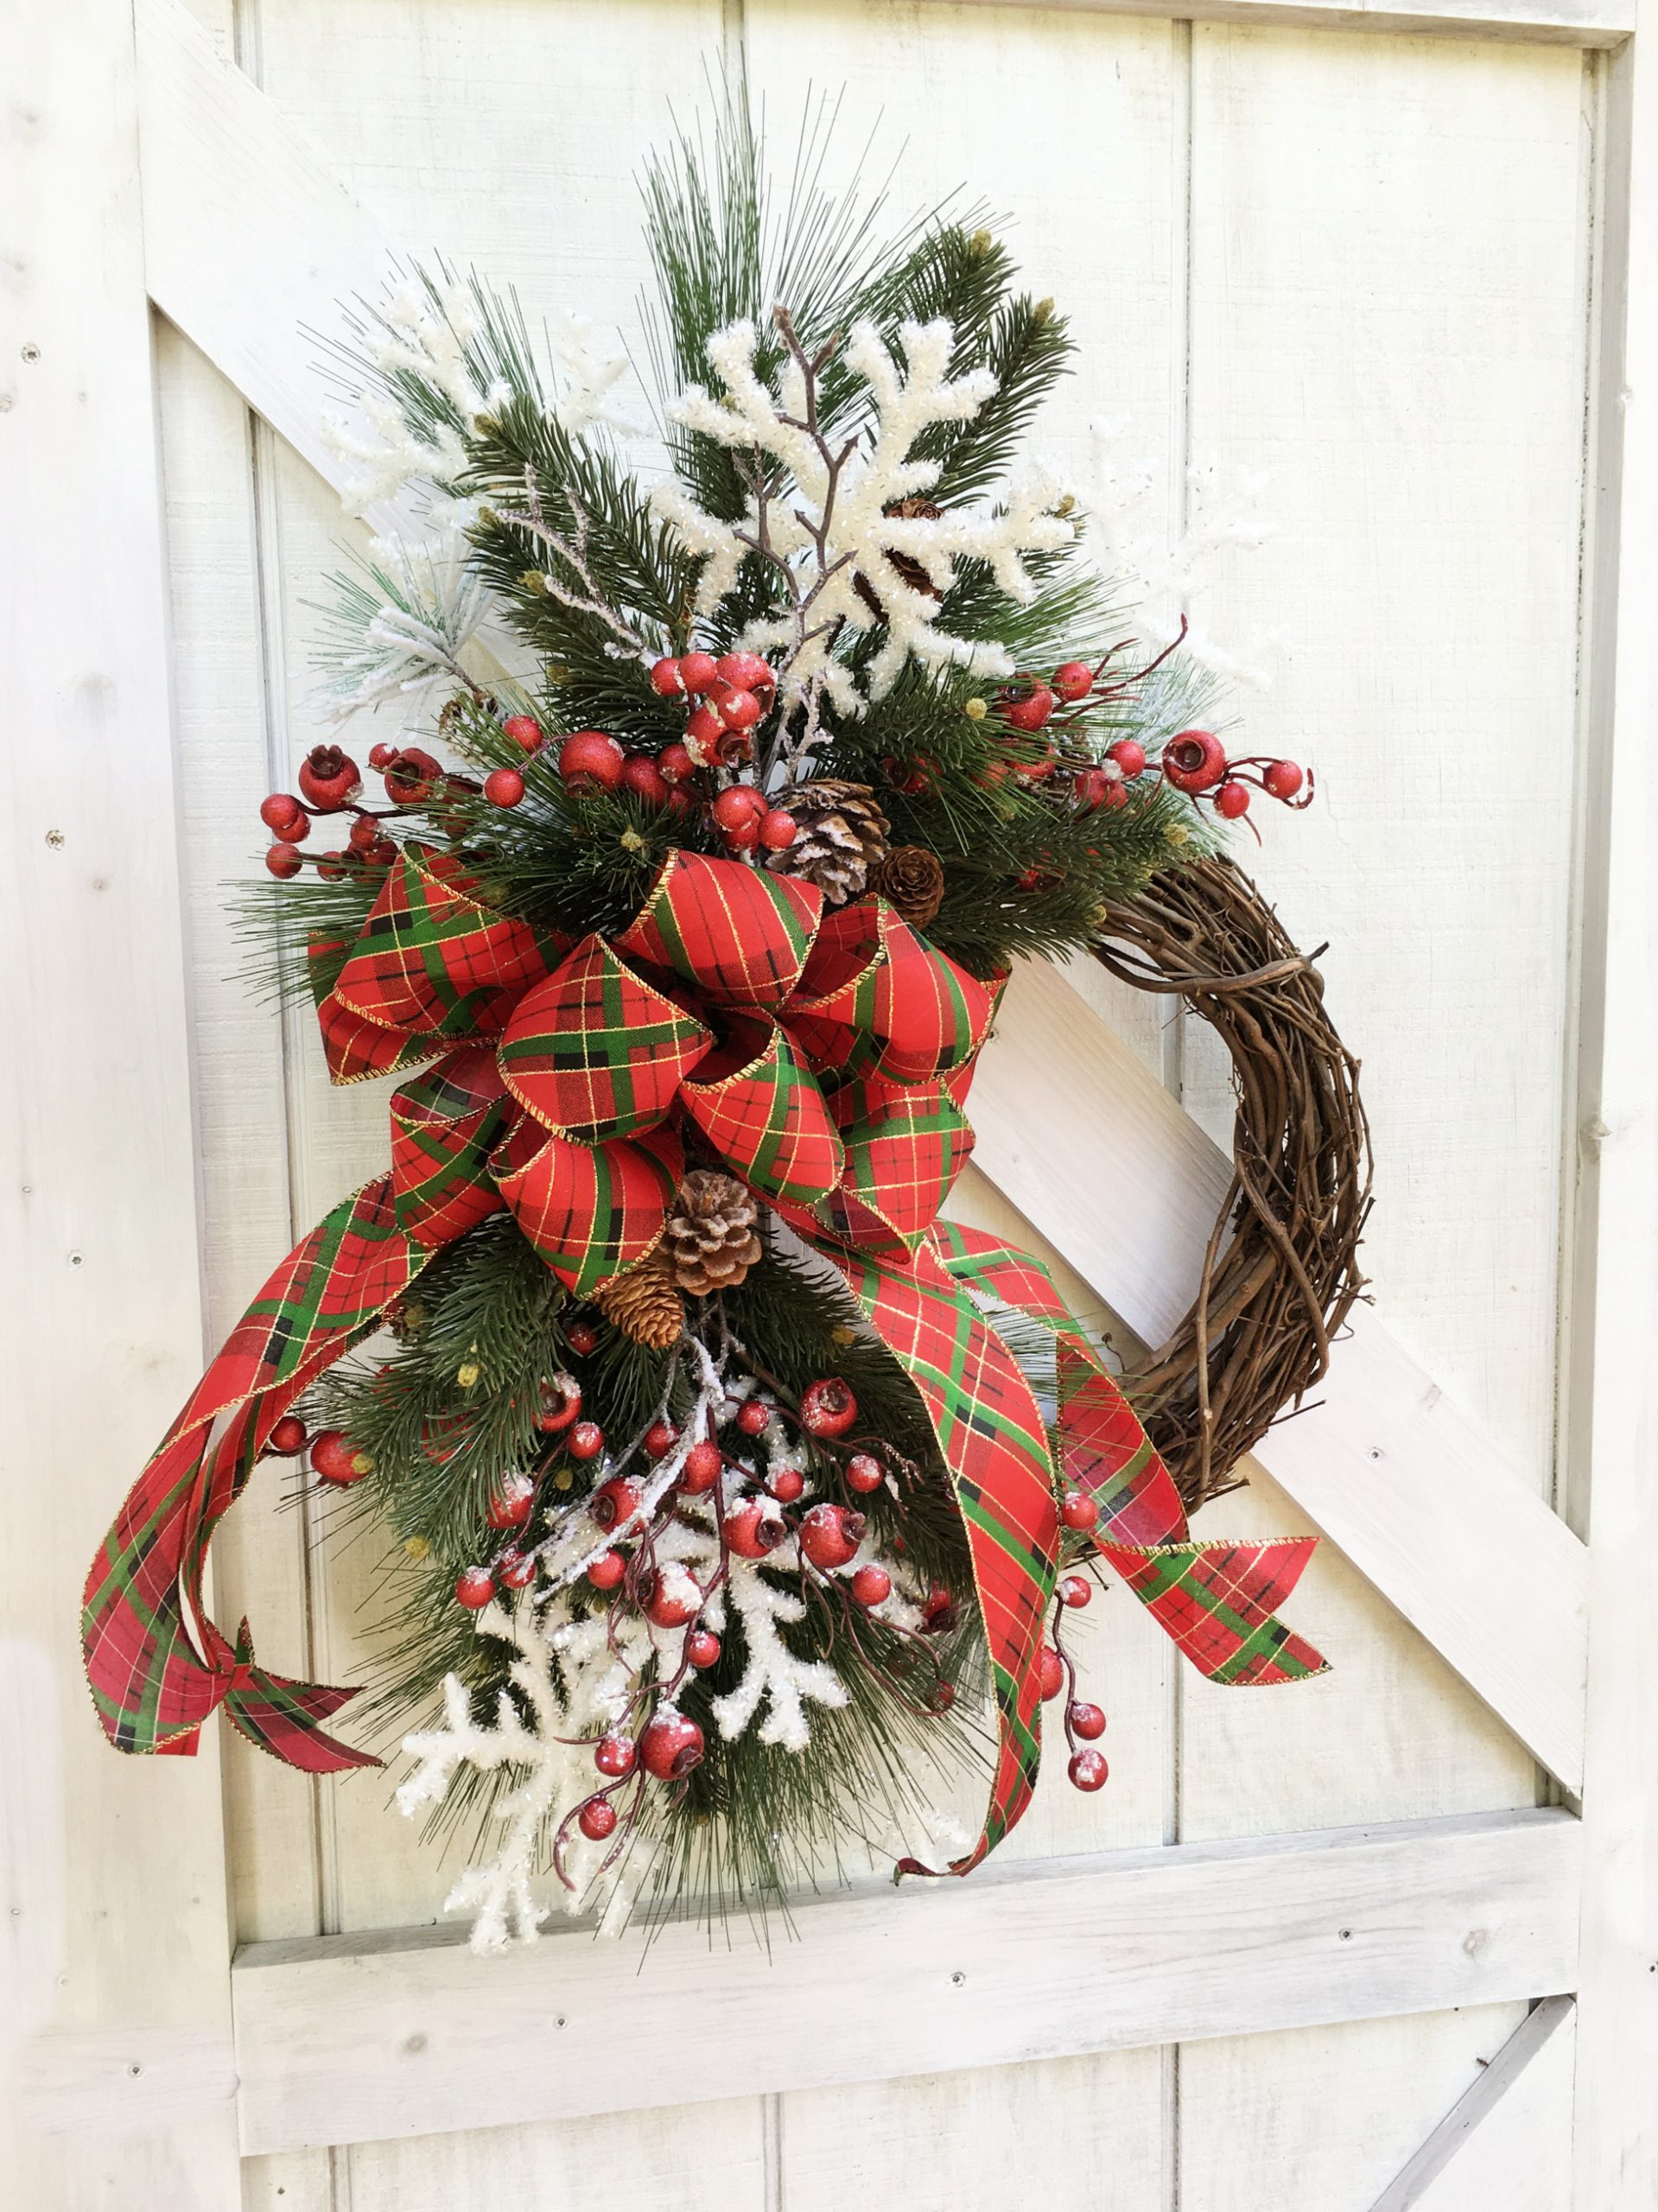 How to Make a Christmas Grapevine Wreath